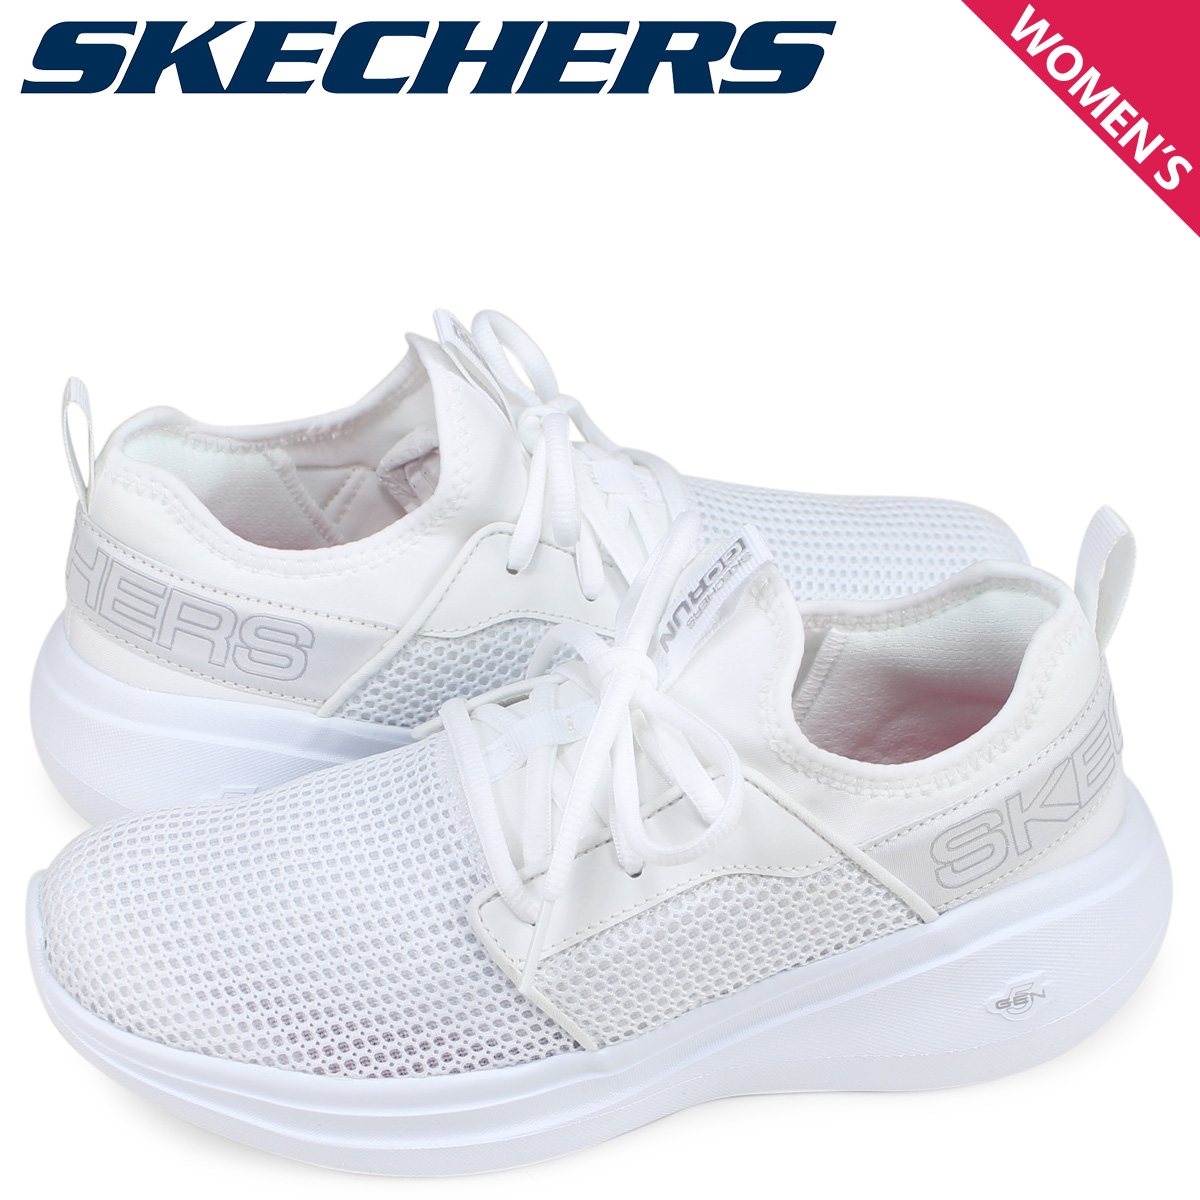 SKECHERS go orchid sneakers